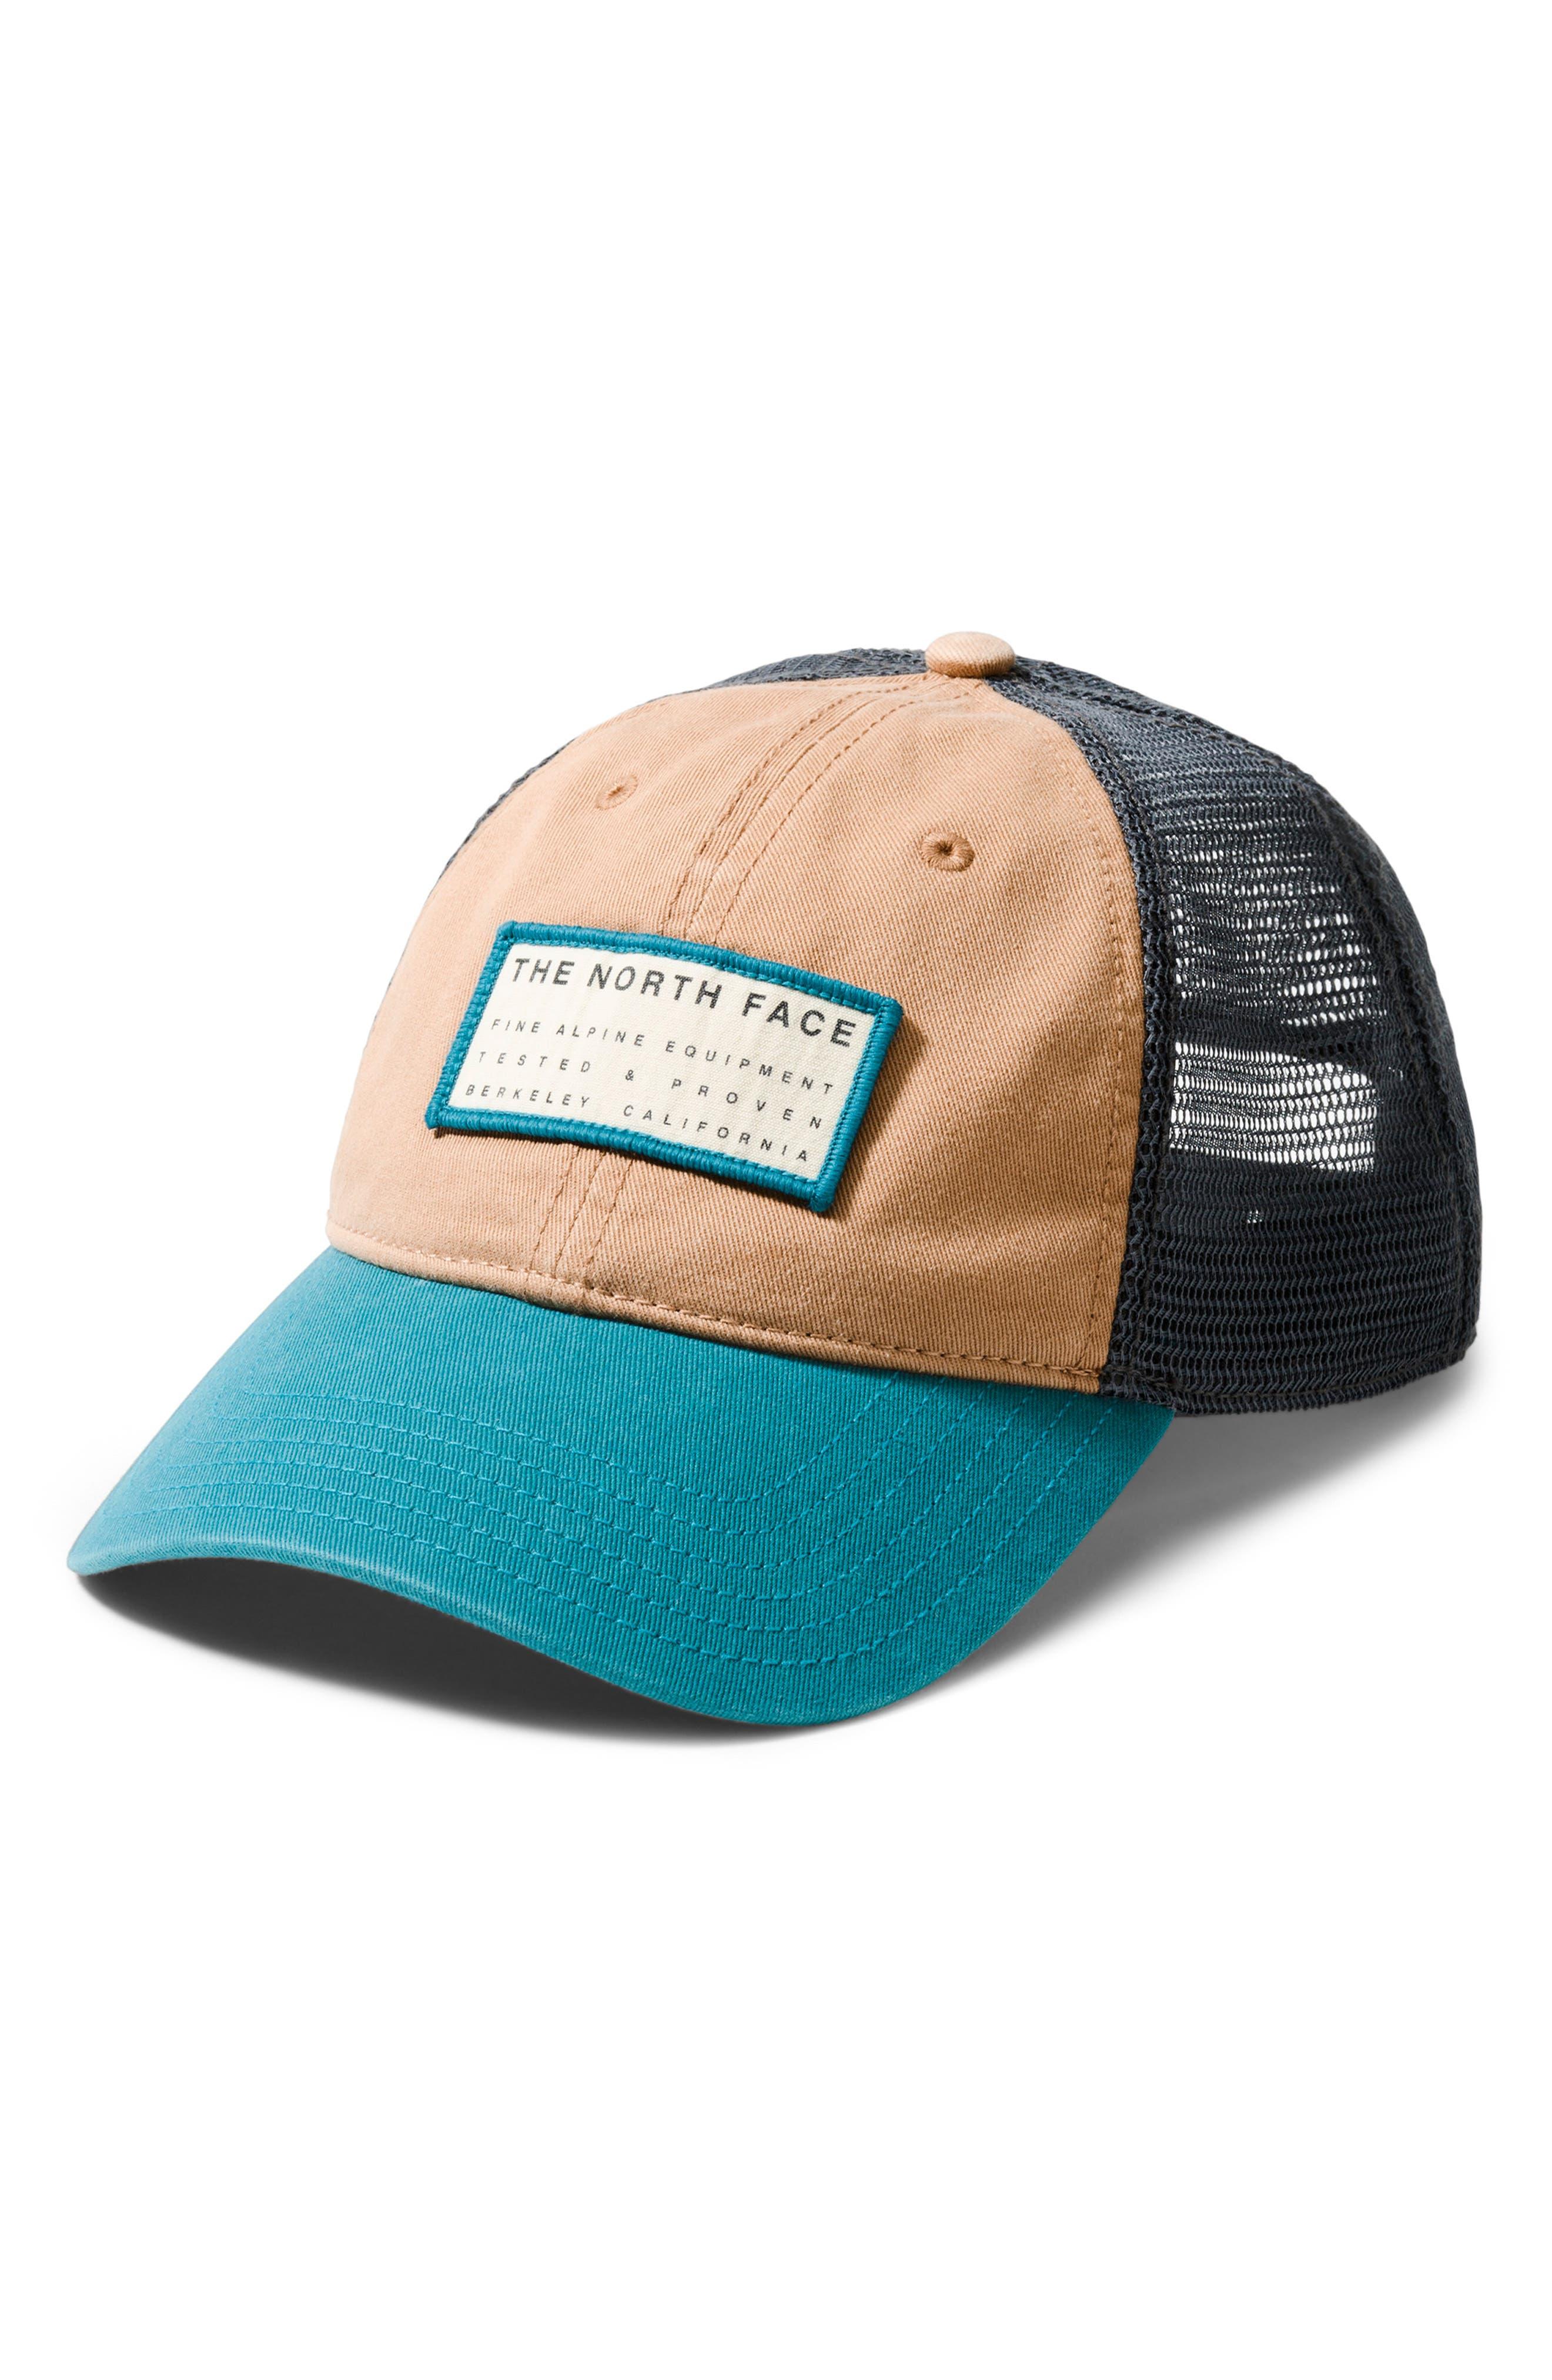 cb20c3f8b2611 Men s The North Face Hats